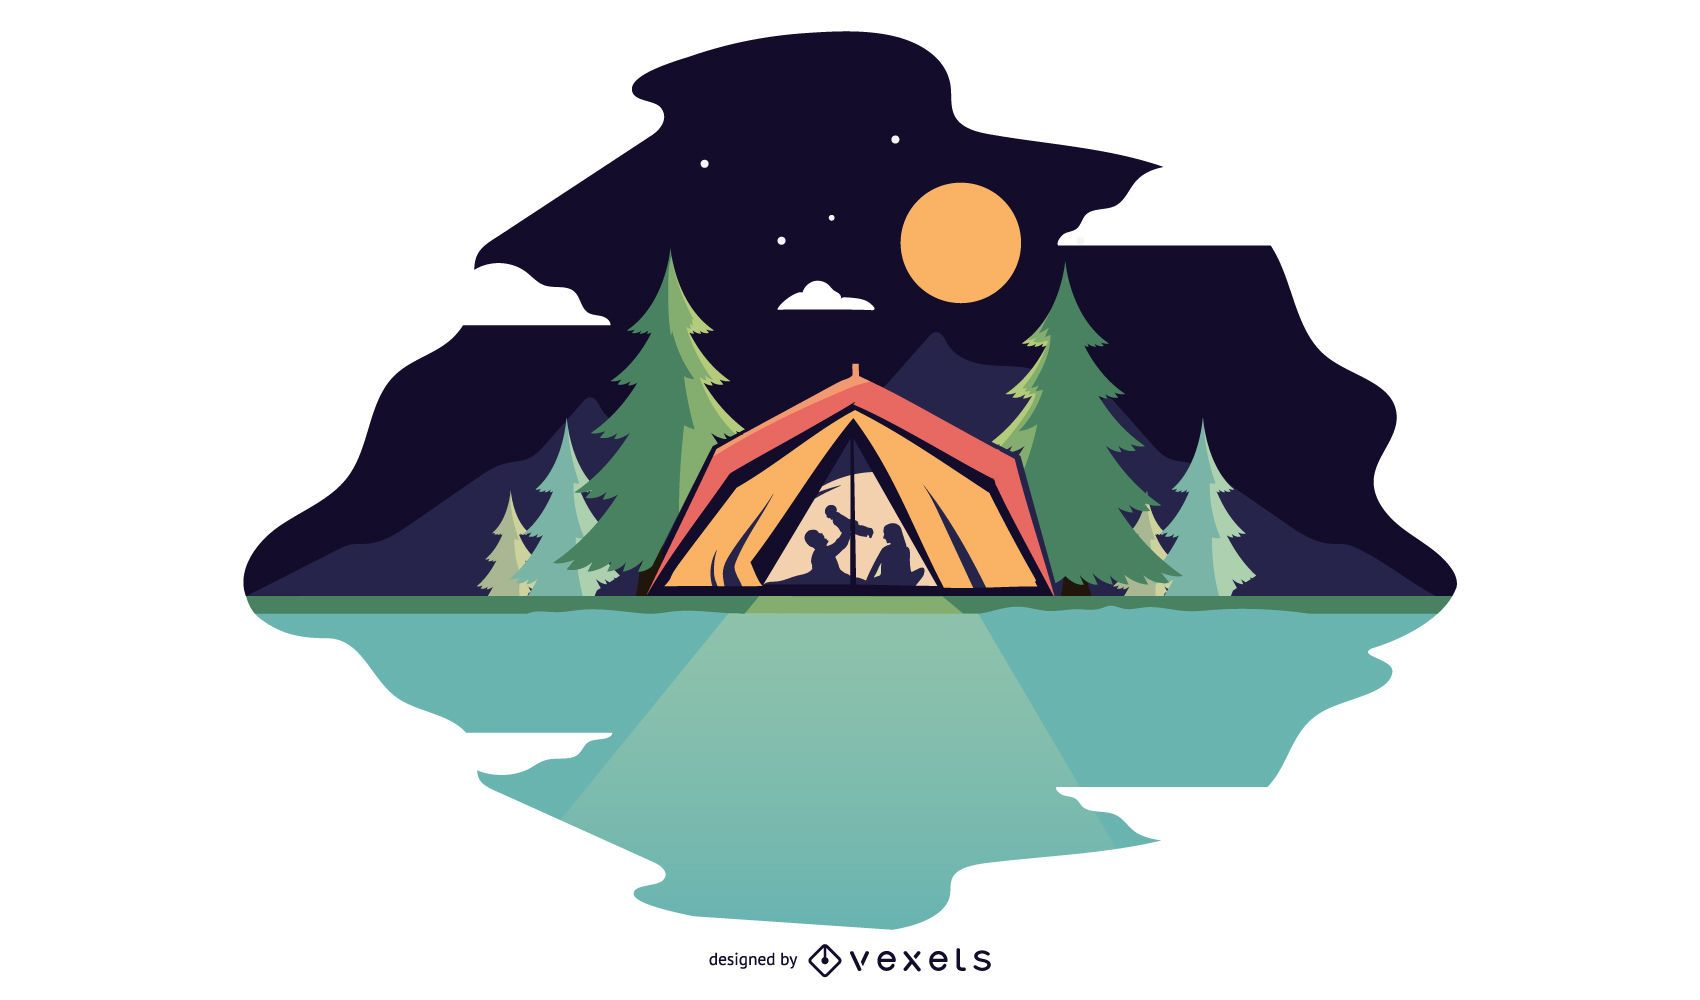 Night Camping Family Illustration